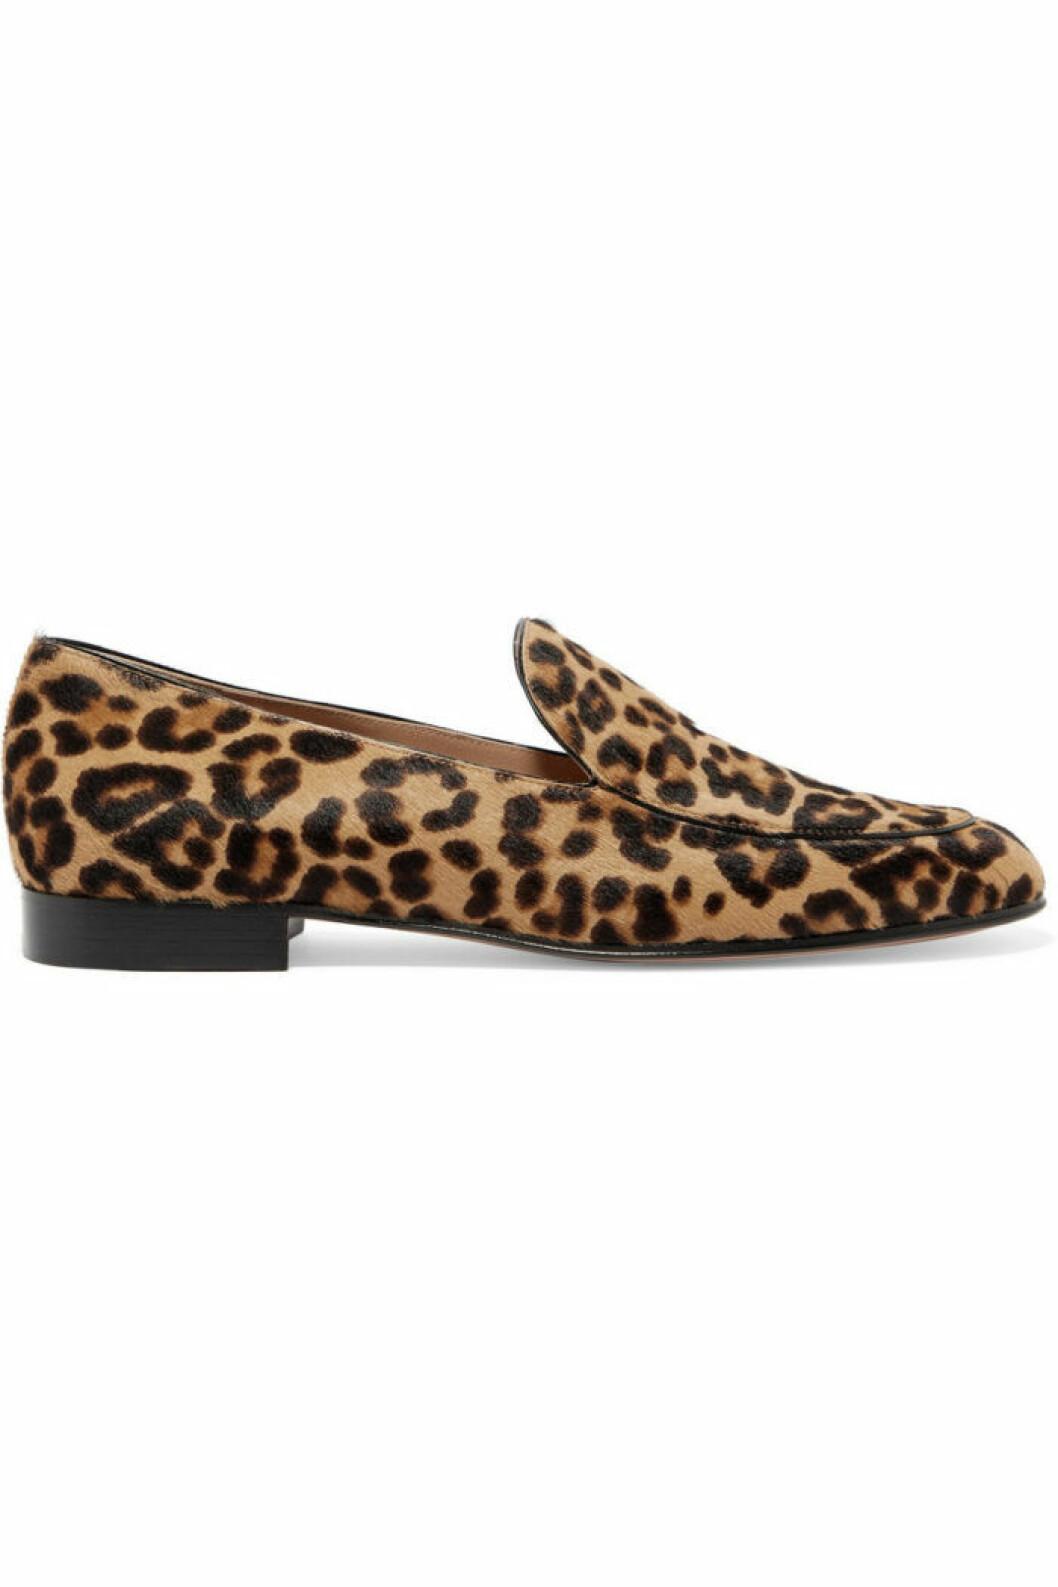 Leopardmönstrad loafer i klassisk modell